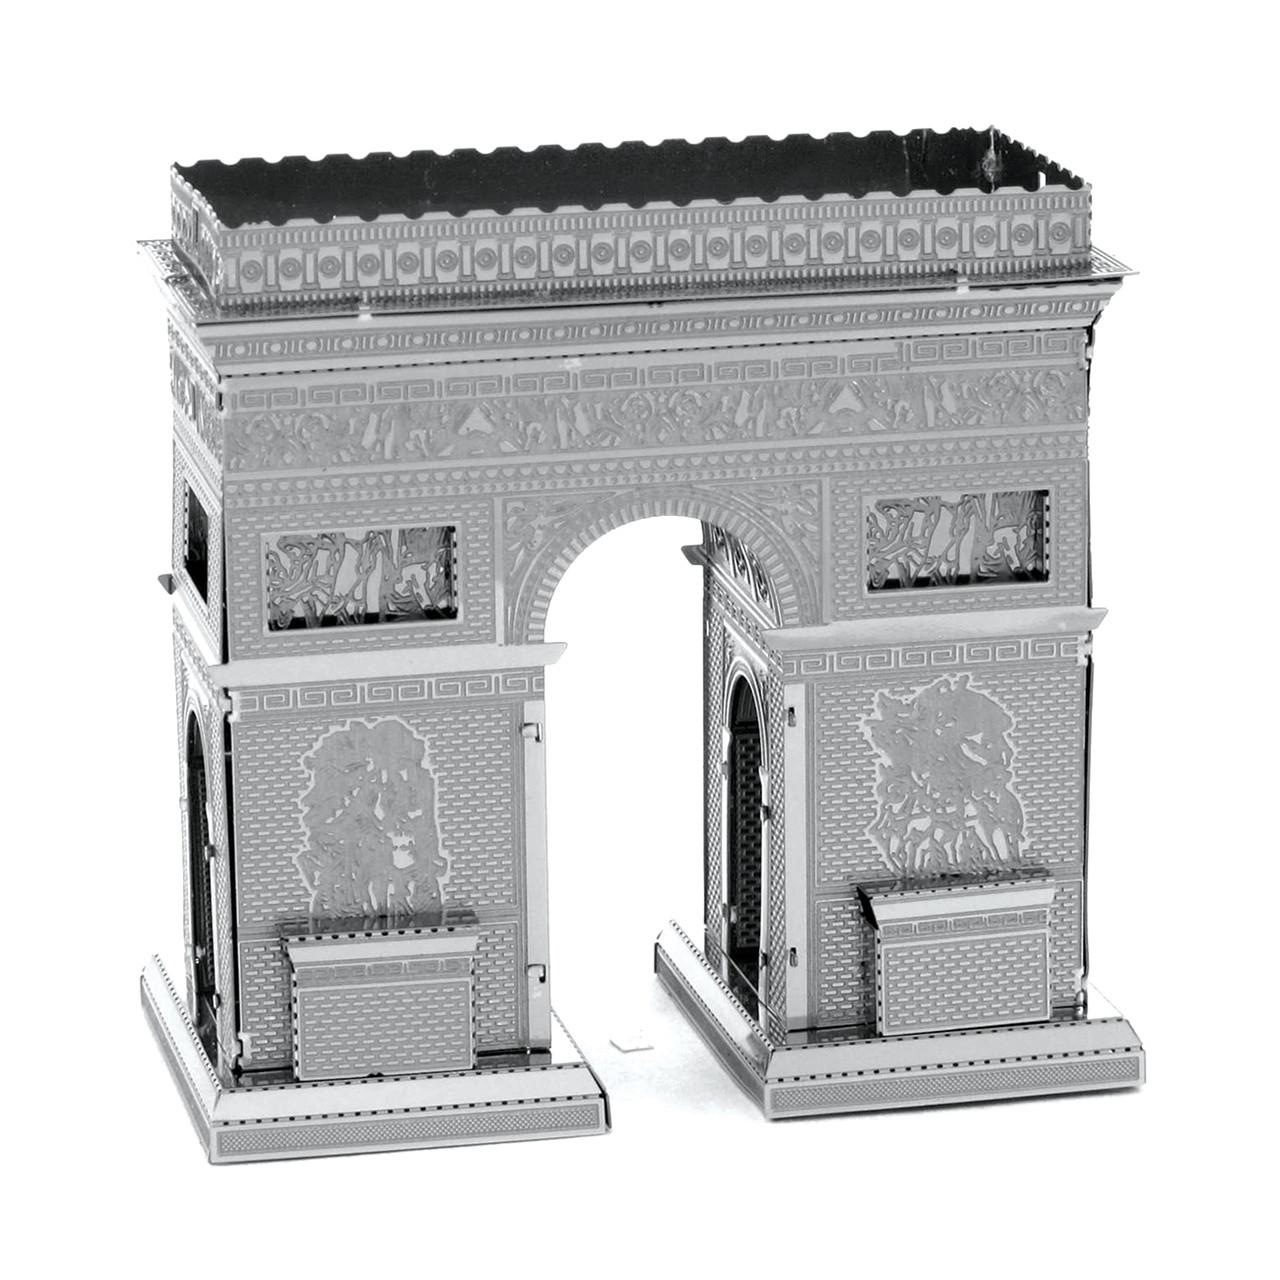 3D конструктор Триумфальная арка (185-18410457)